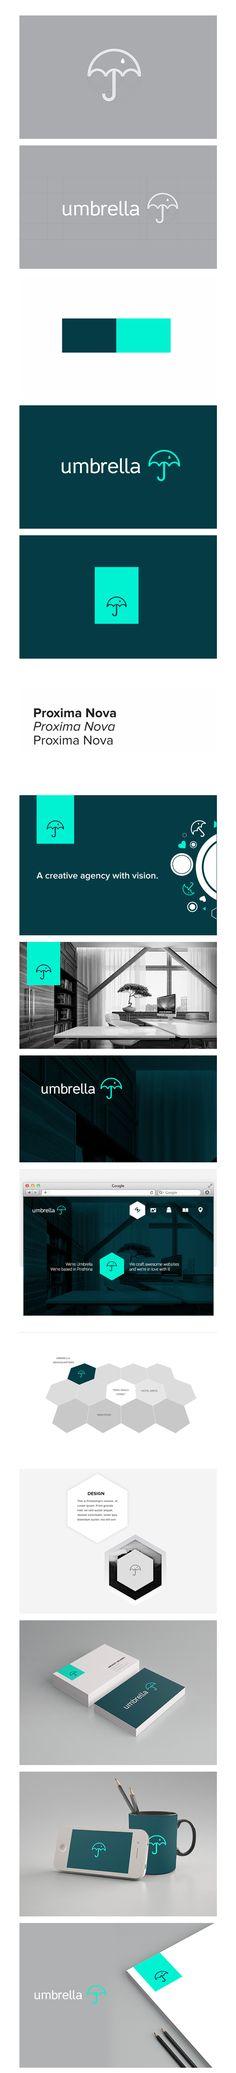 Umbrella / Arian Selimaj